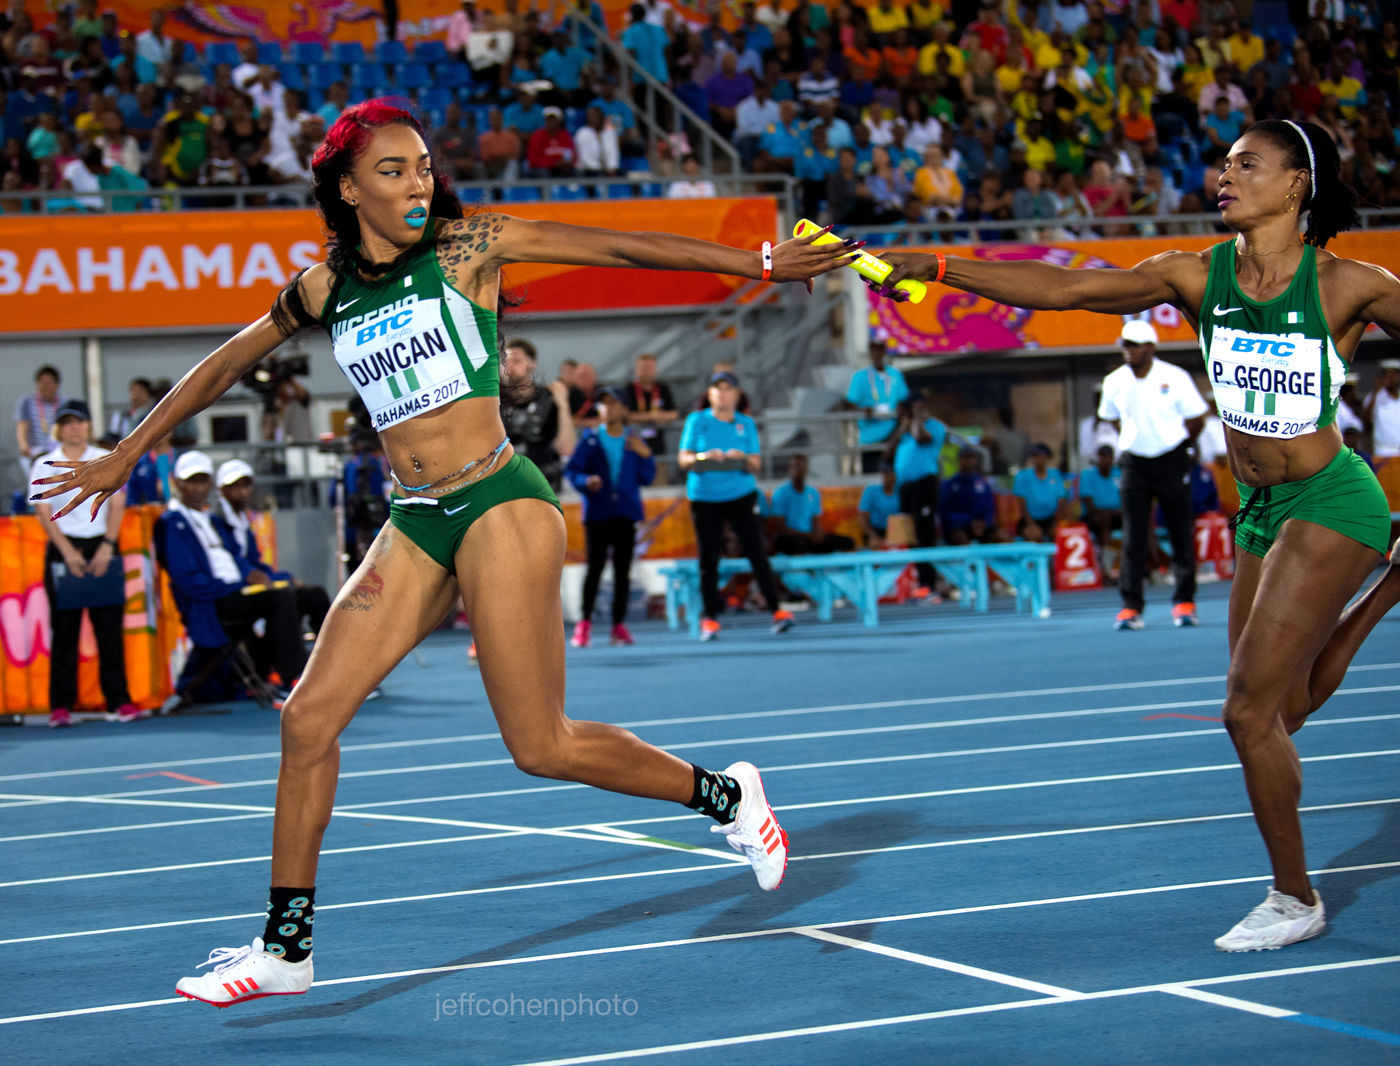 1r2017_bahamas_relays_day_1_dominique_duncan_patience_george_4x400_nigeria___jeff_cohen_photo__527_web.jpg